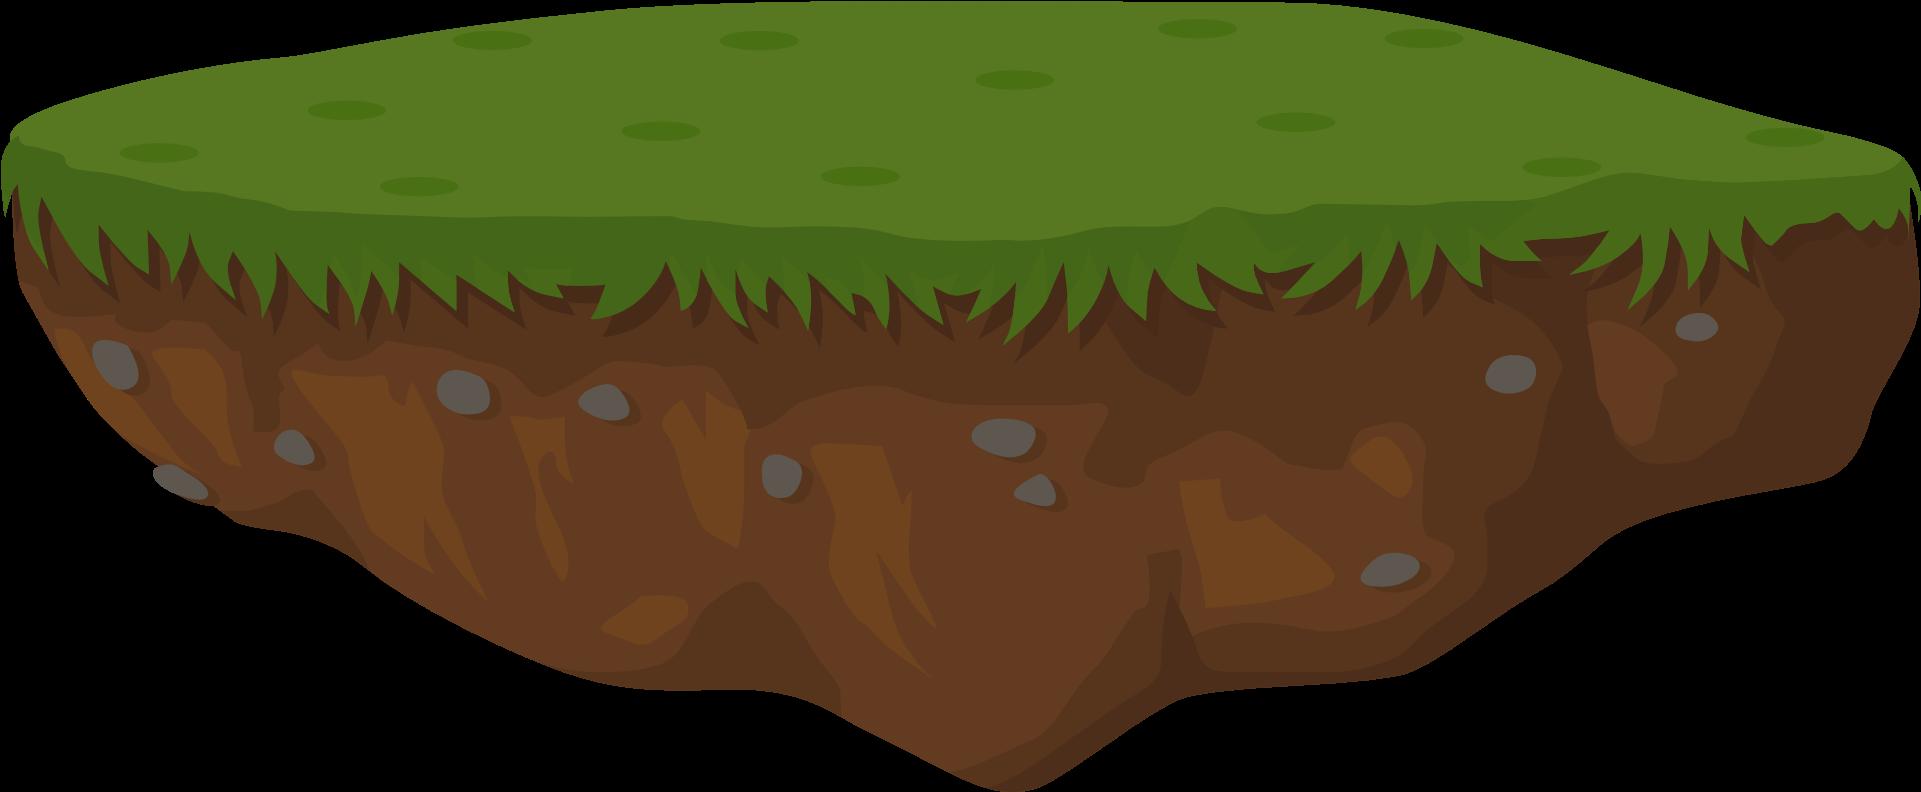 Land png transparent cartoon. Earth clipart dirt